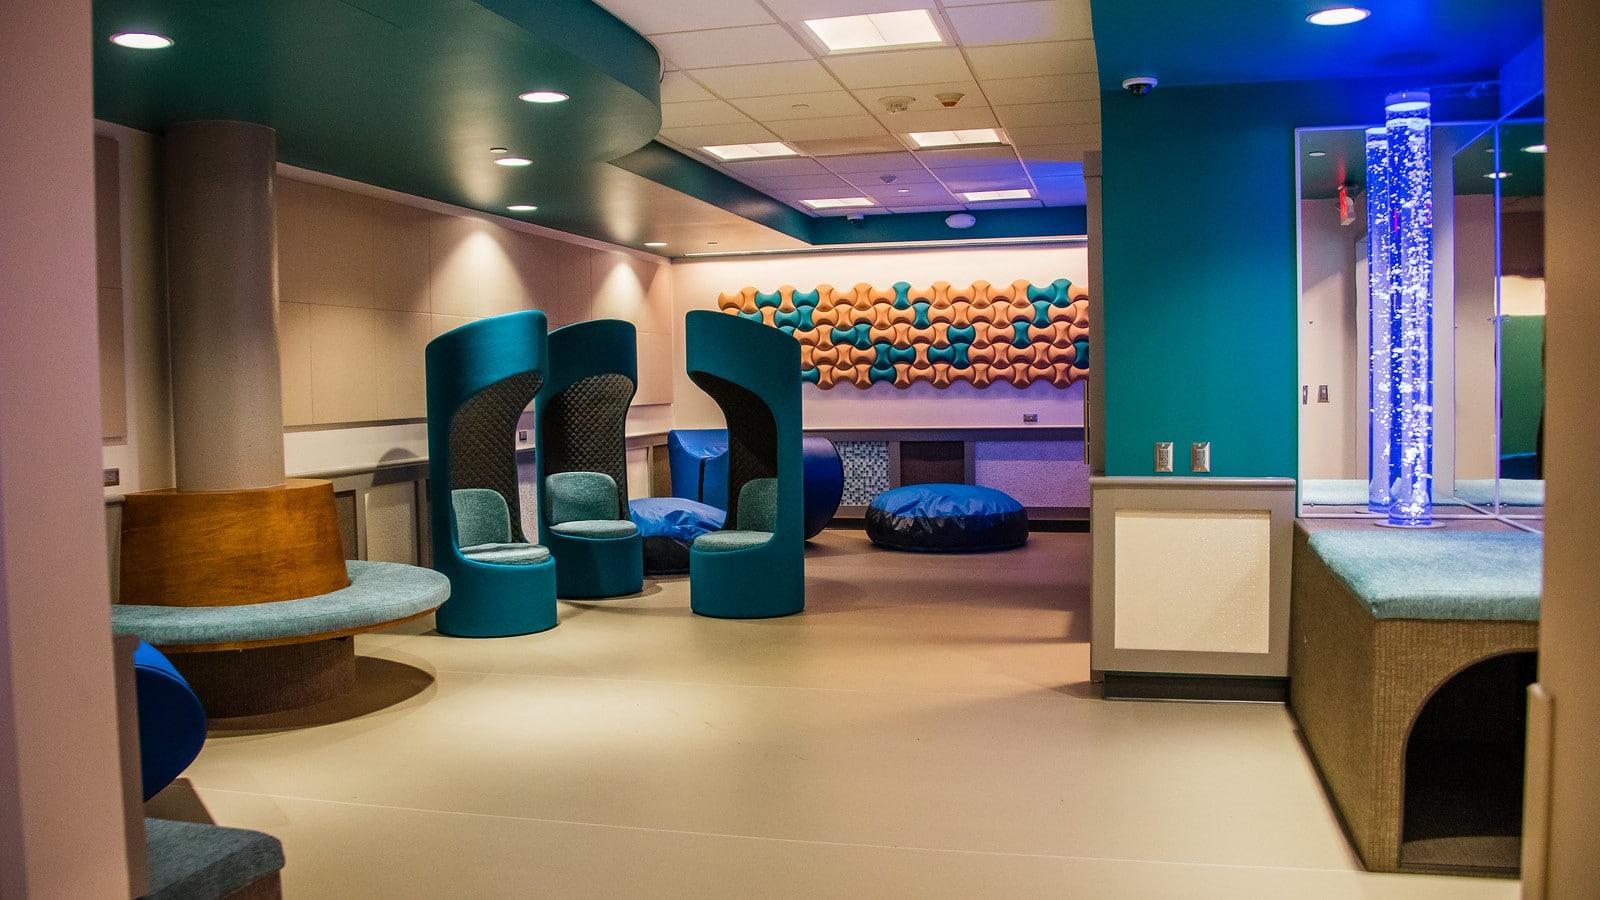 Airport Sensory Room